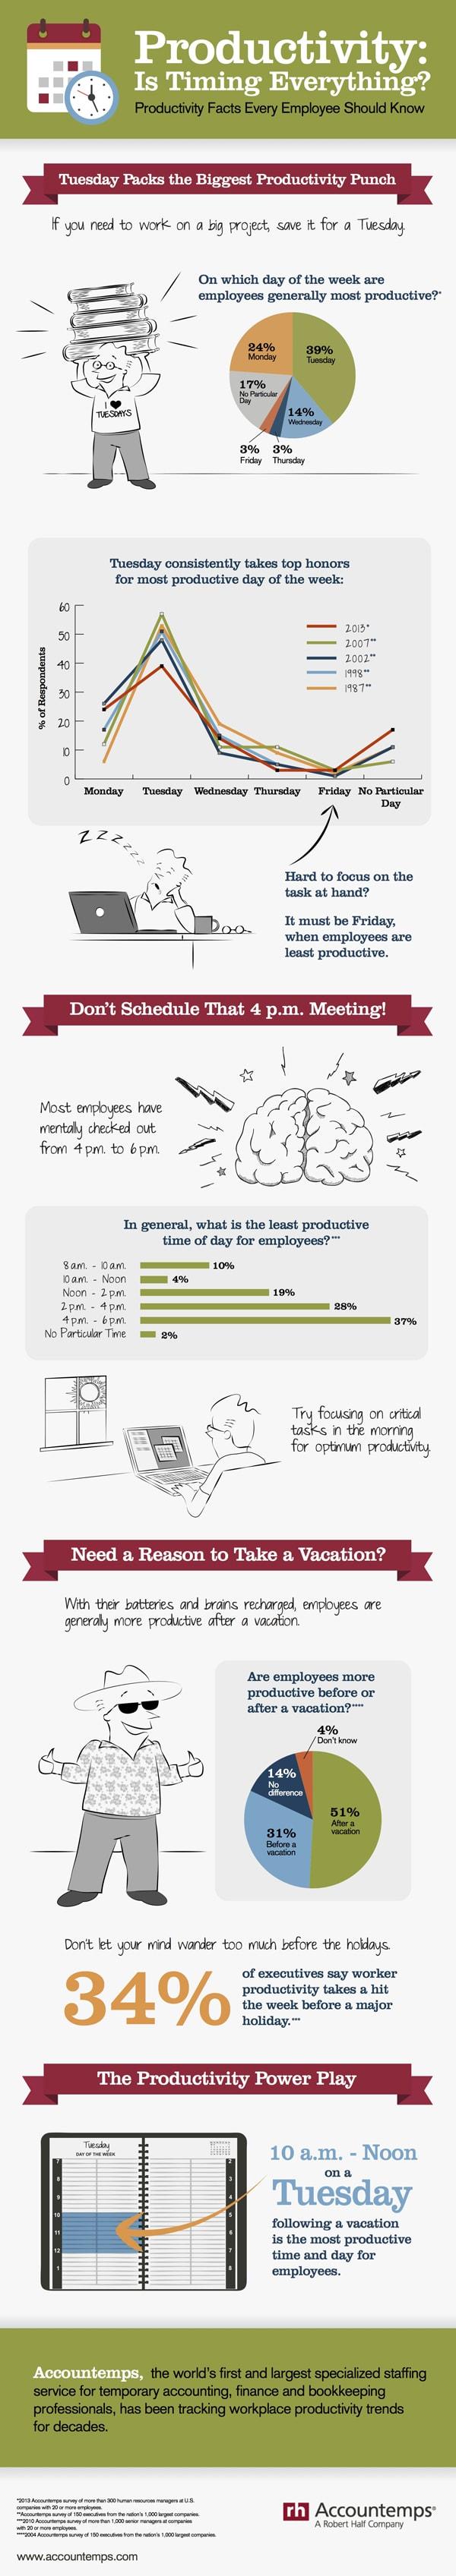 boostproductivity